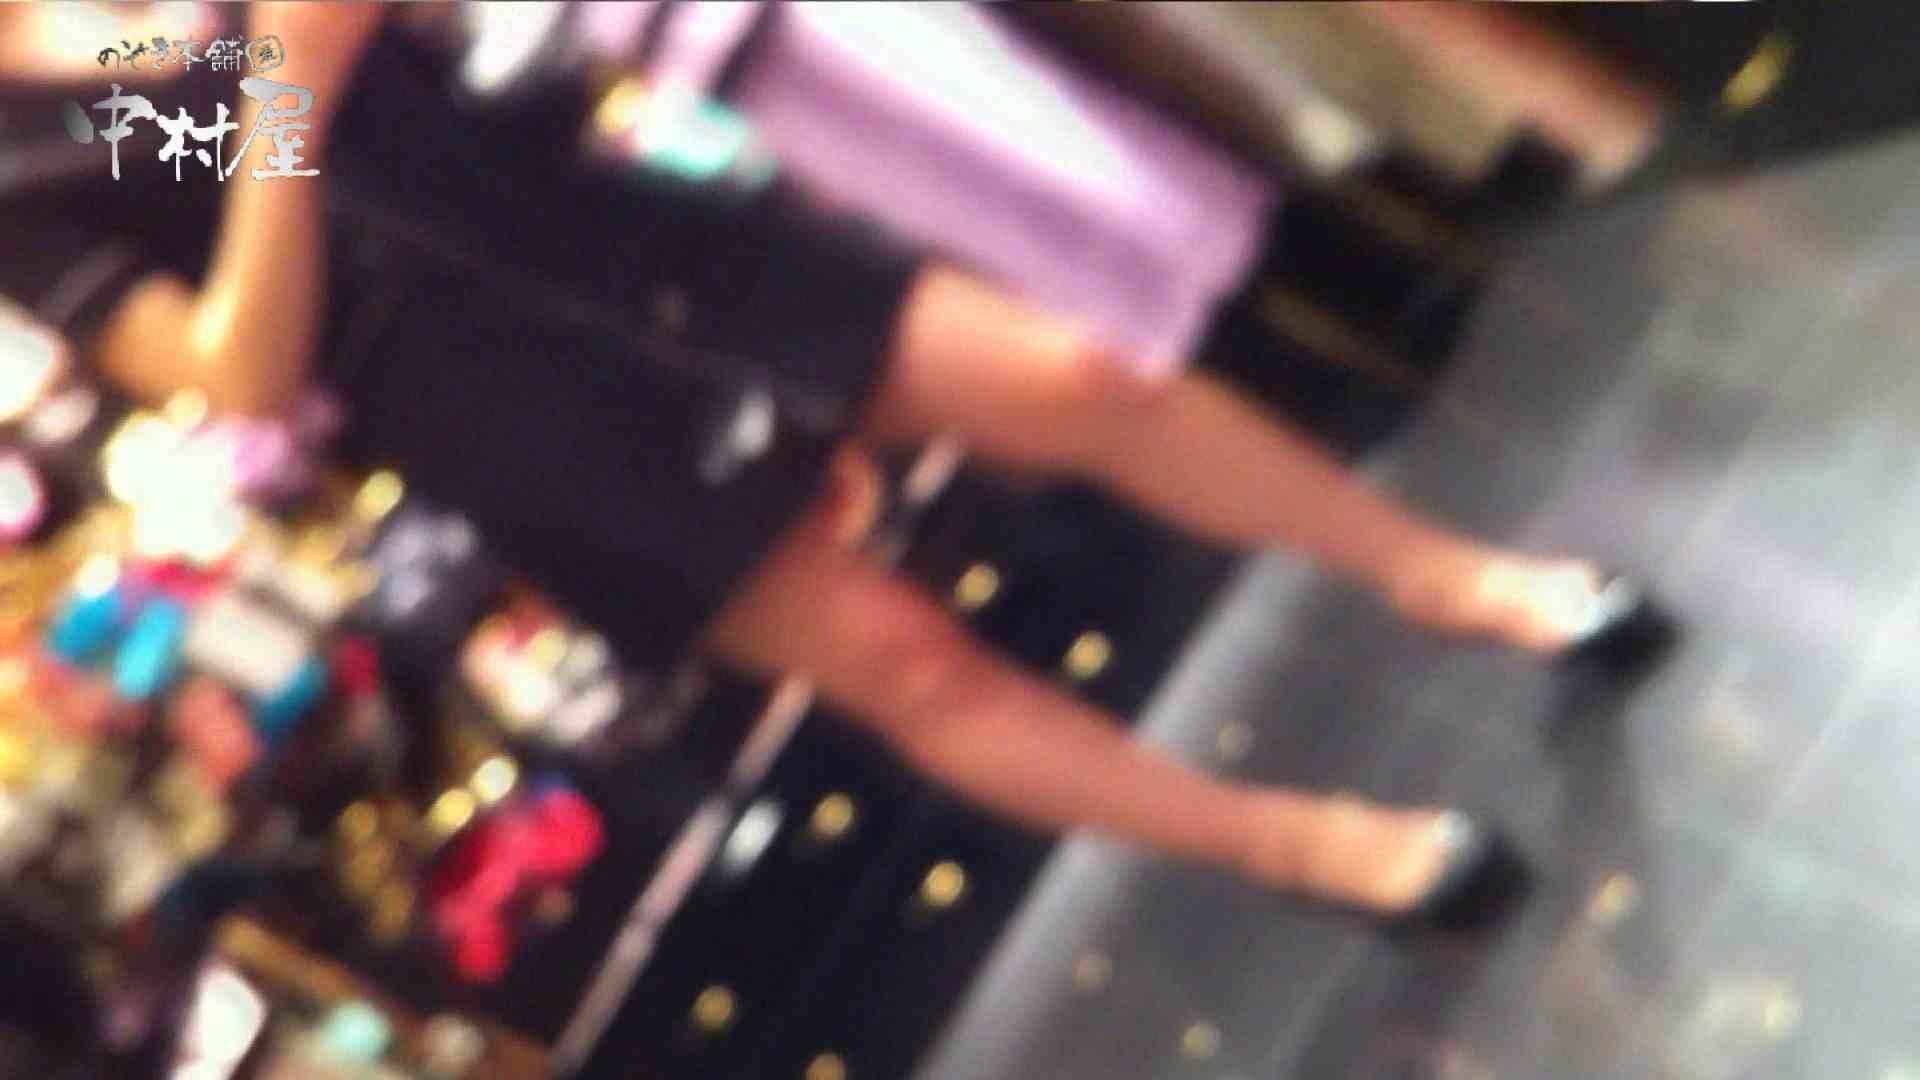 vol.47 カリスマ店員胸チラ&パンチラ 黒パン店員さん 胸チラ おめこ無修正動画無料 79連発 44